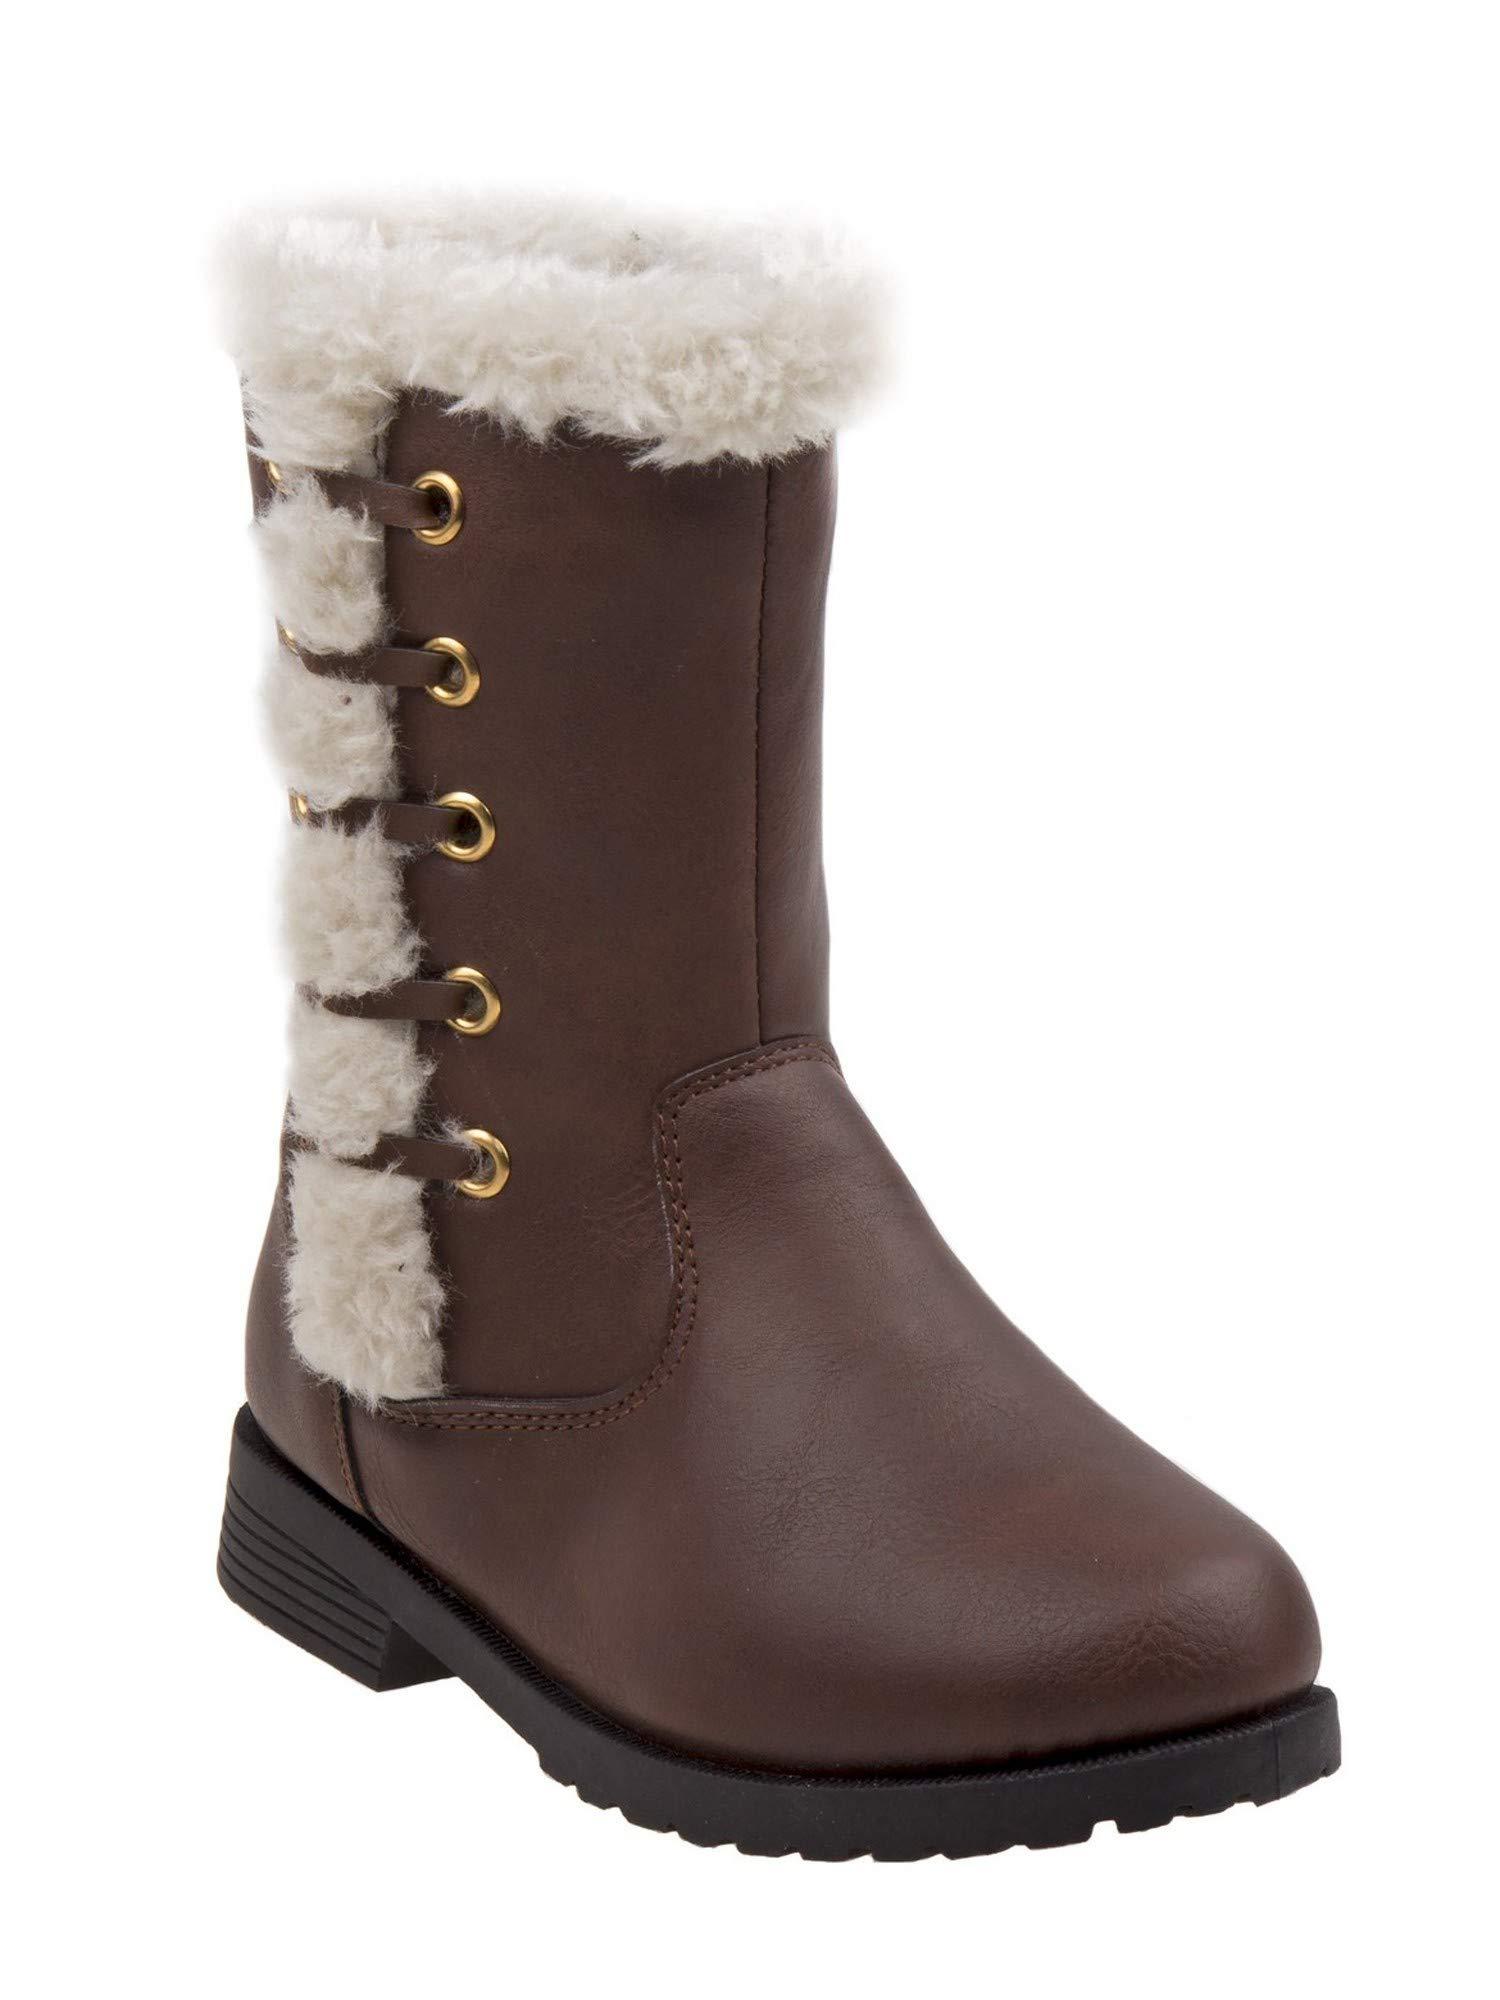 Rugged Bear Little Girls Brown Faux Fur Trim Side Zip Boots 9 Toddler